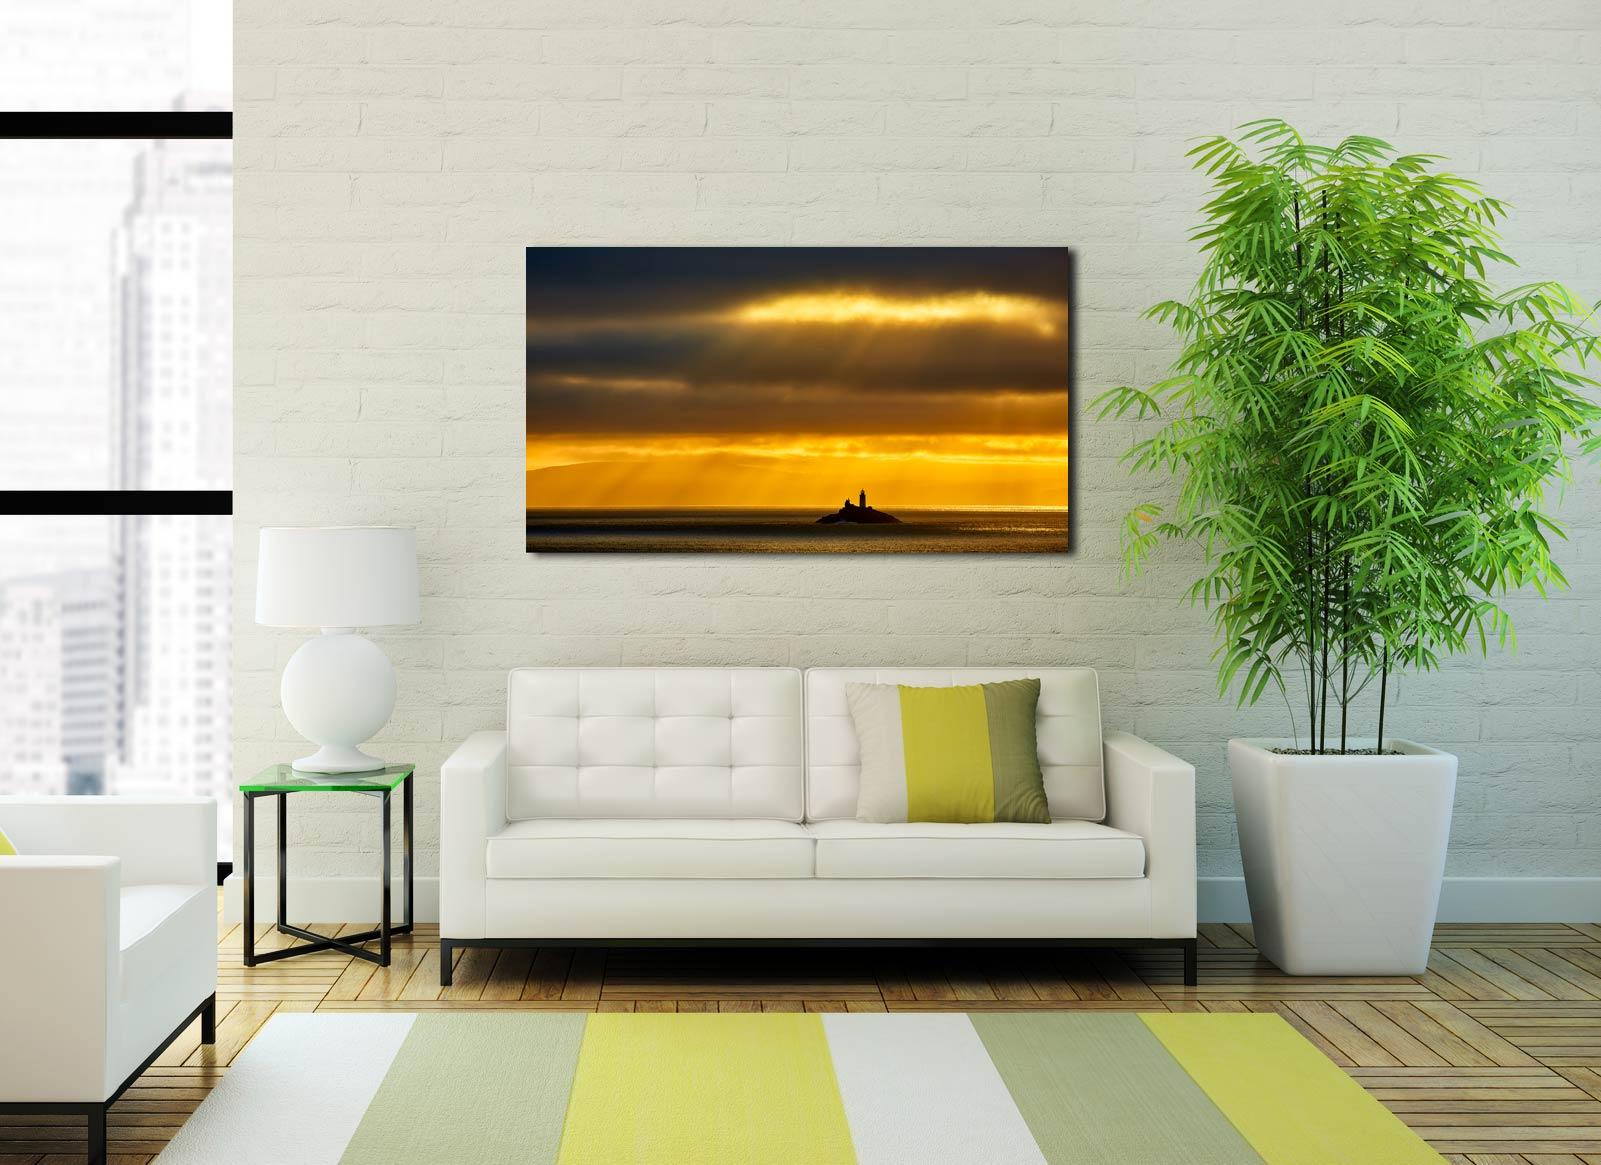 Morning Rays Over Godrevy Lighthouse - Print Aluminium Backing With Acrylic Glazing on Wall